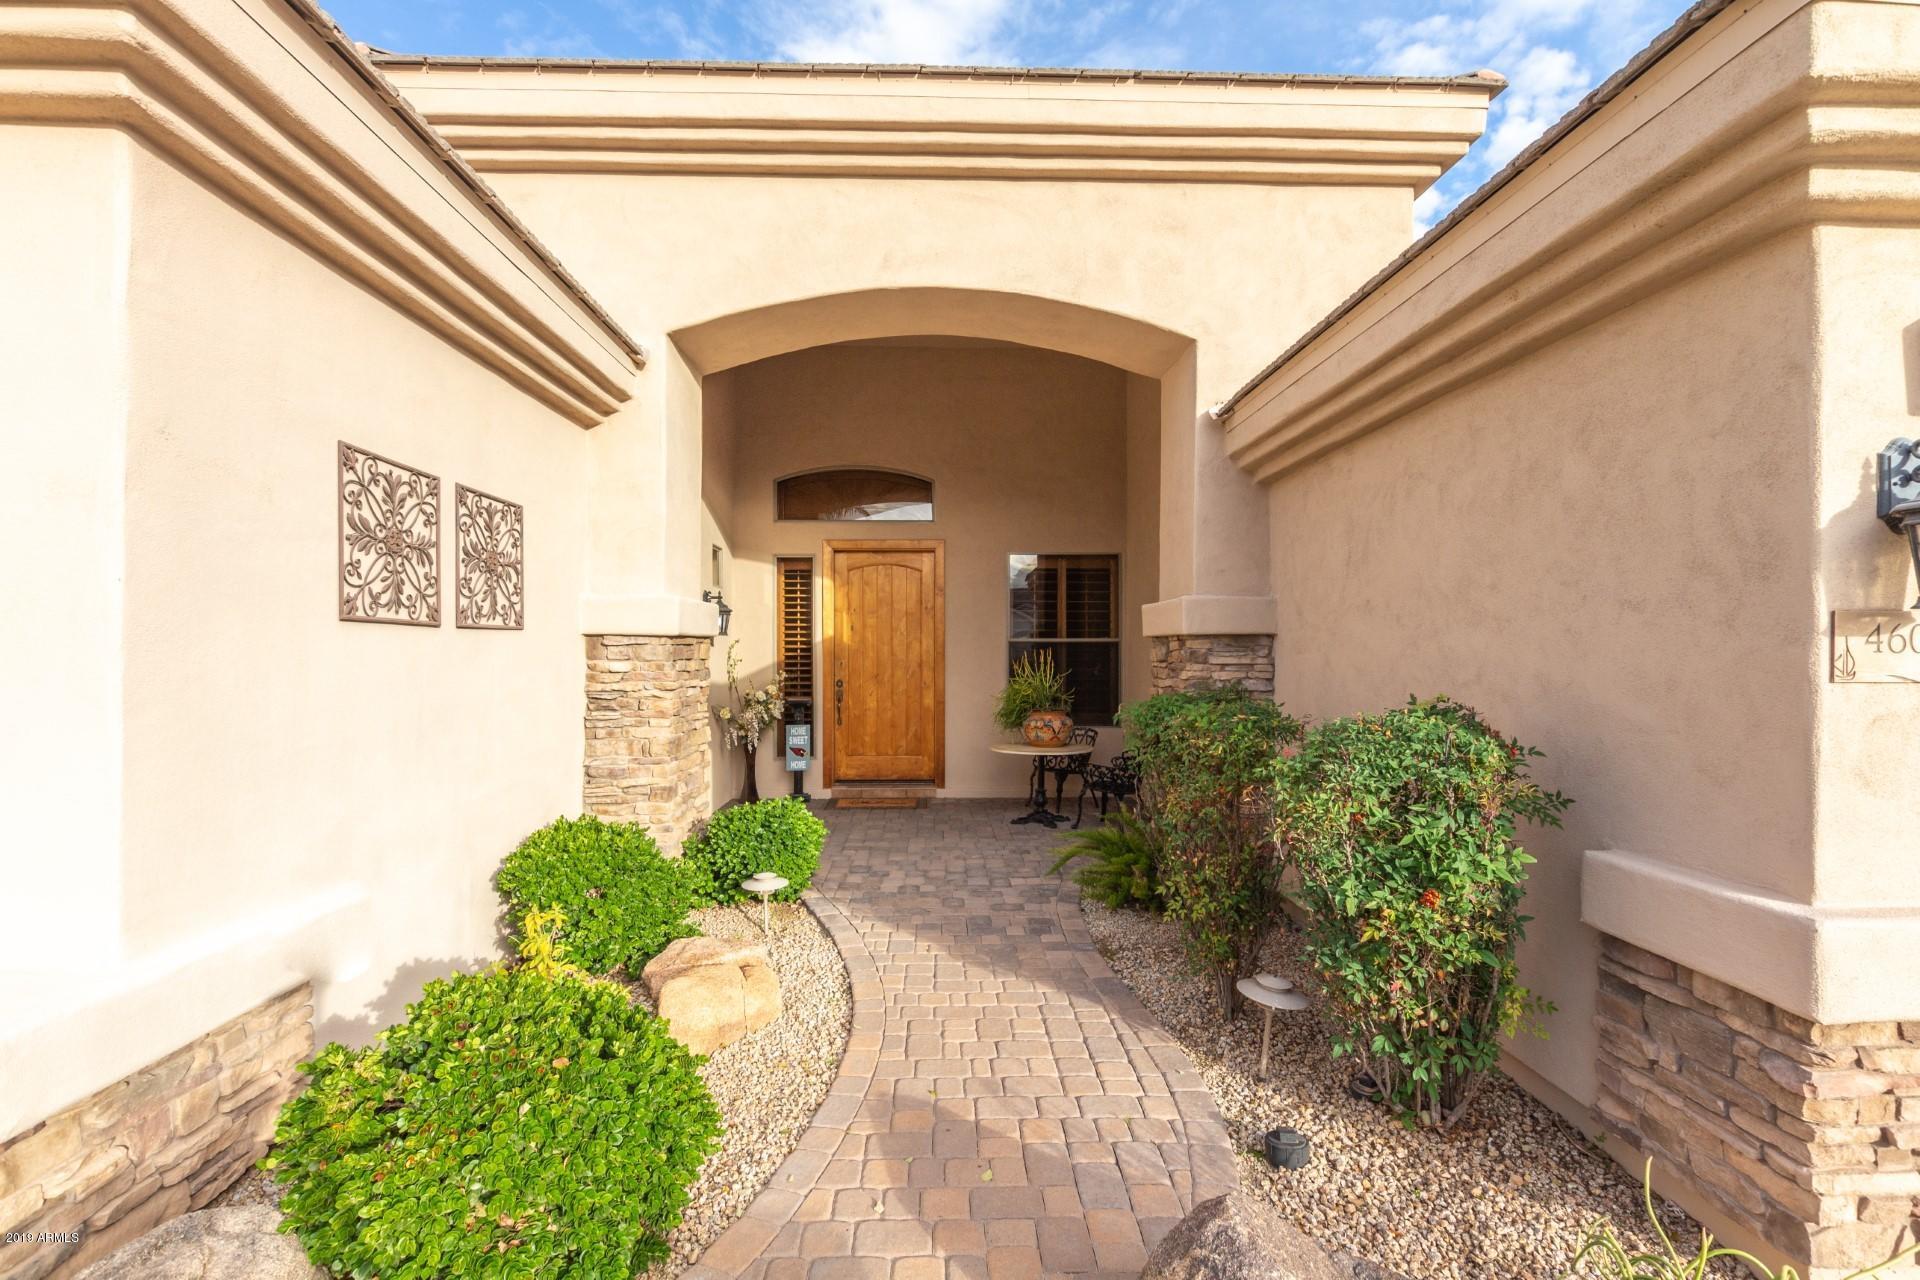 MLS 5881508 4601 S AMBROSIA Court, Chandler, AZ 85248 Ocotillo